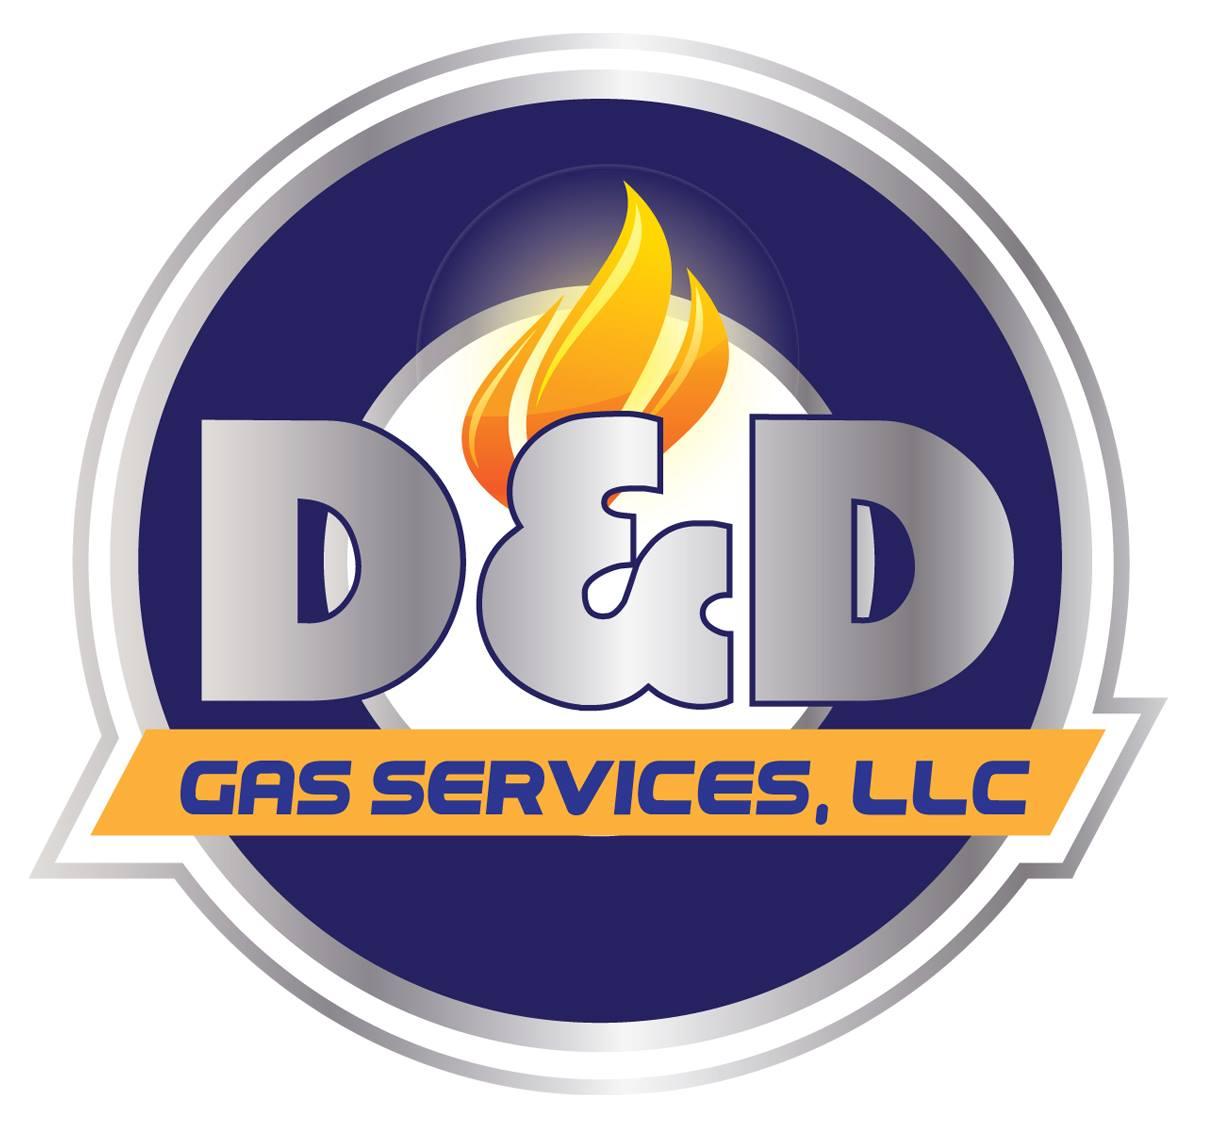 D&D Gas Services, LLC